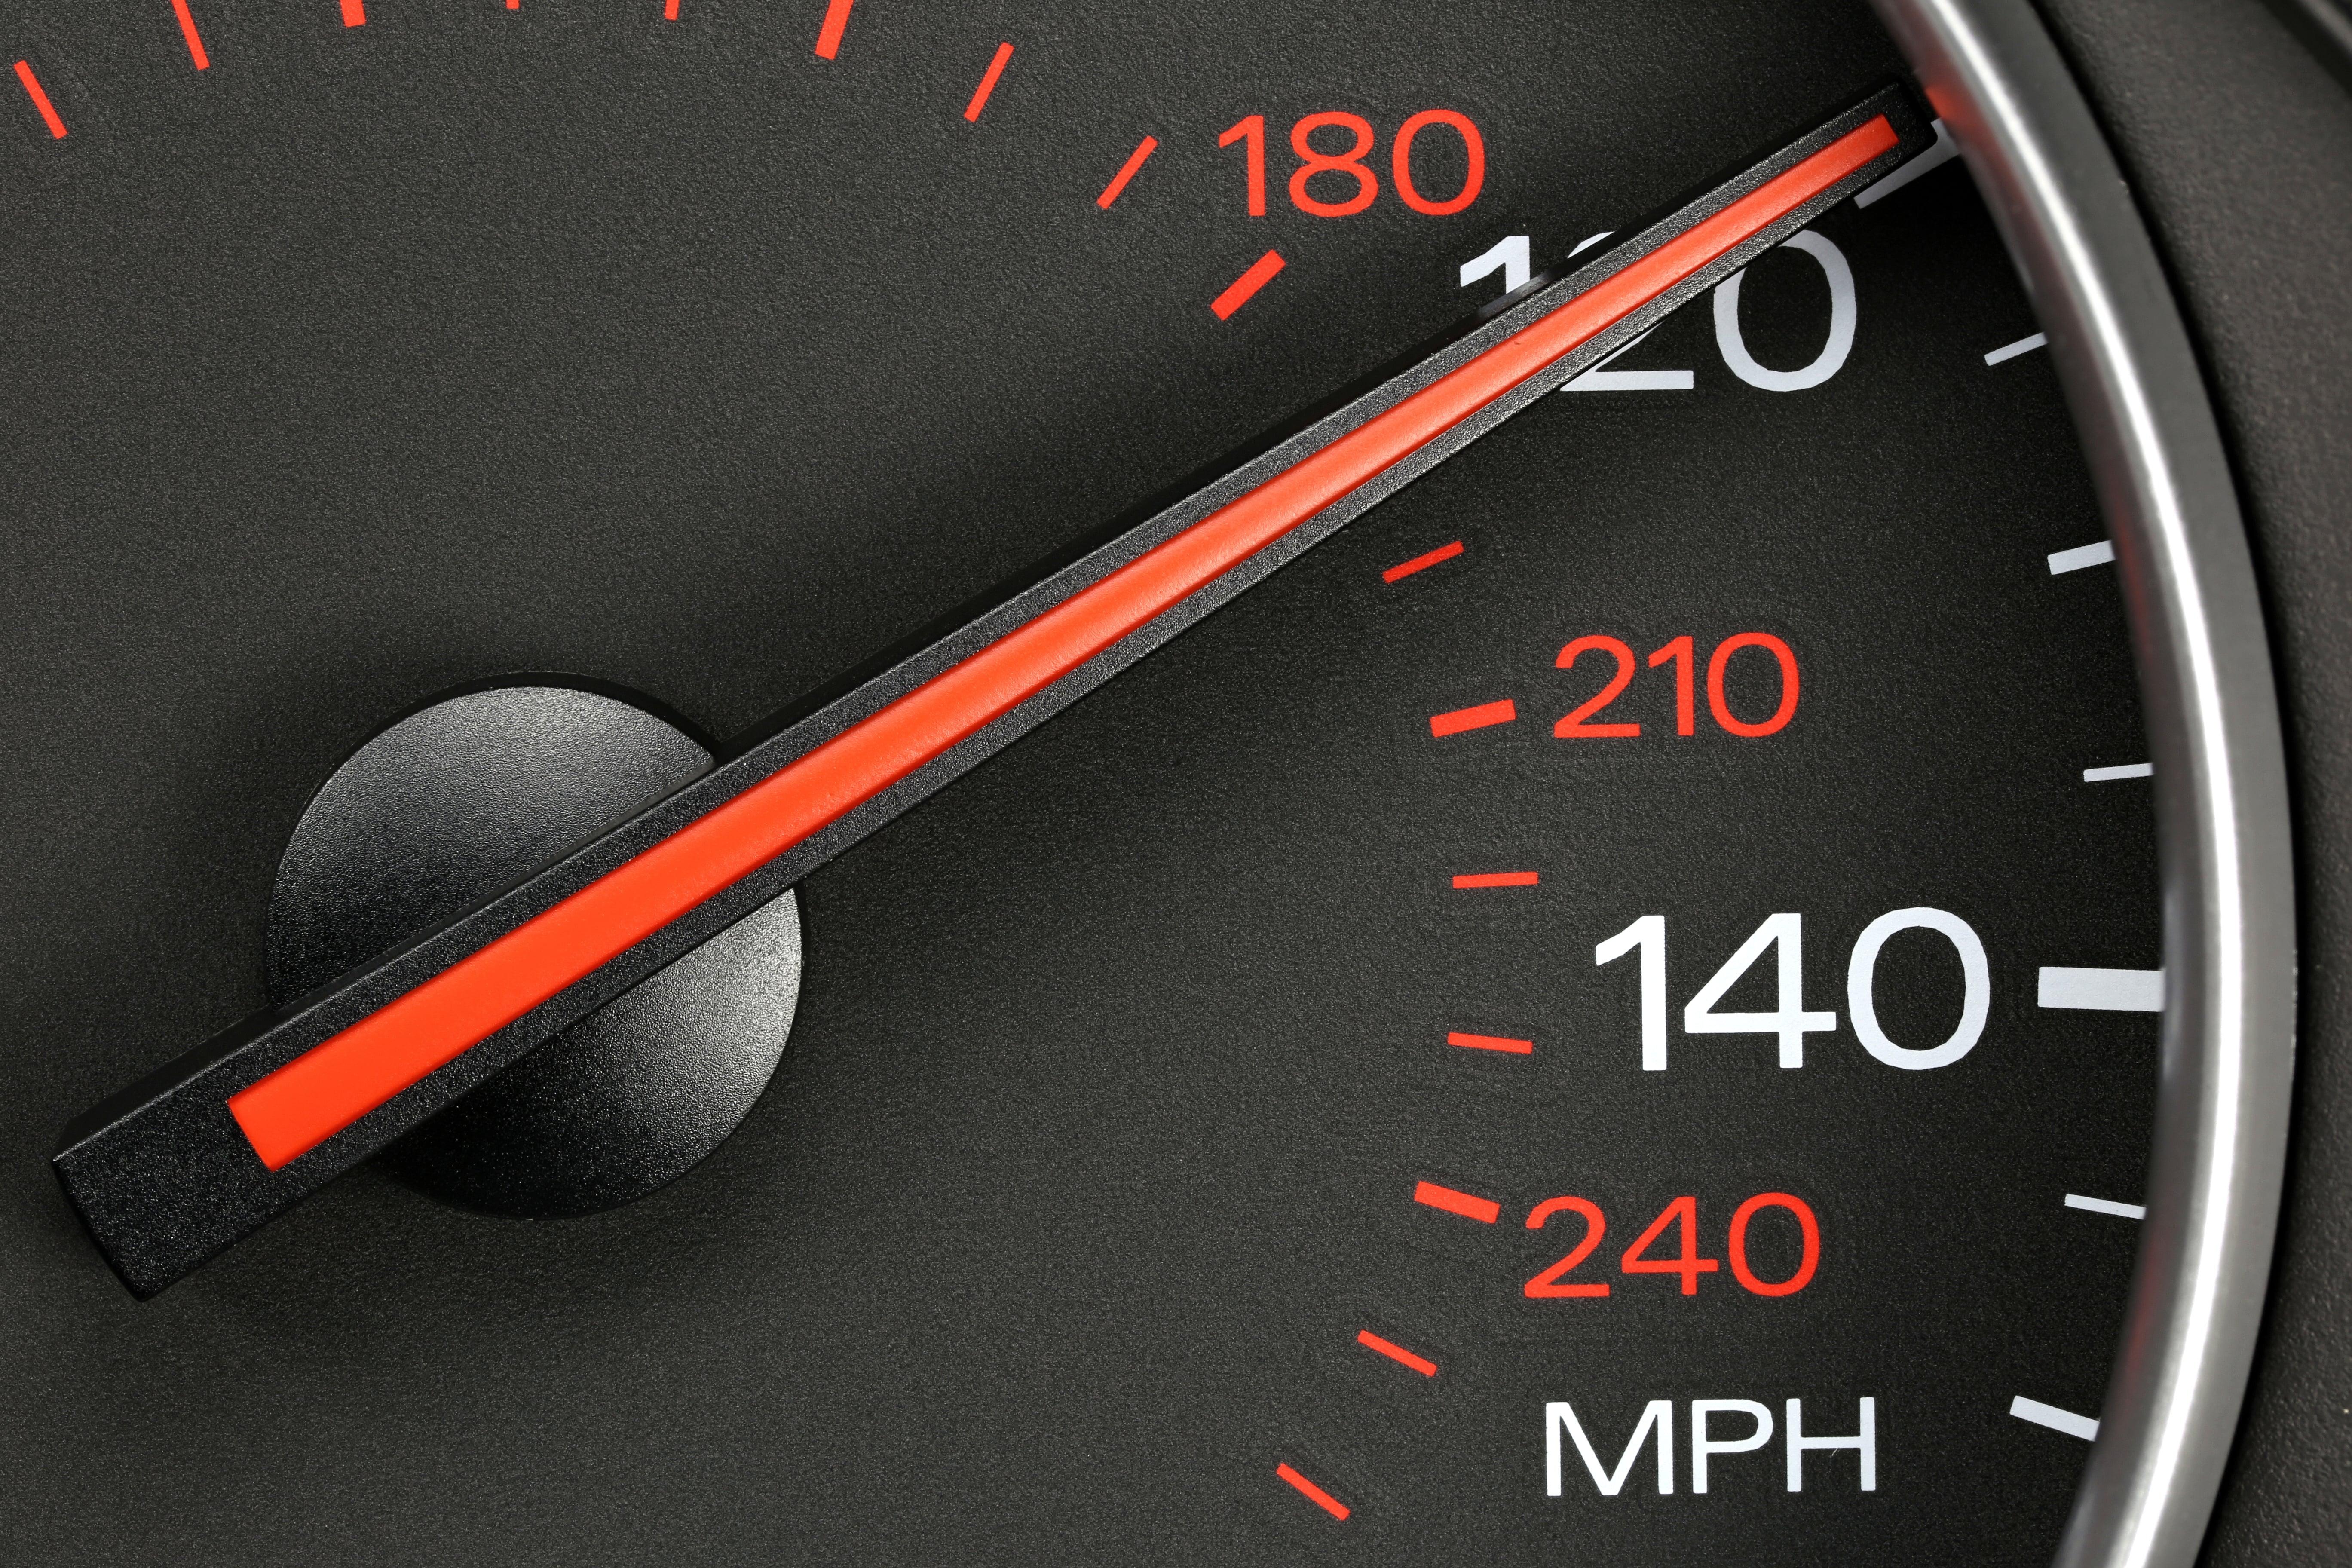 MyAirbags Speedometer Calibration